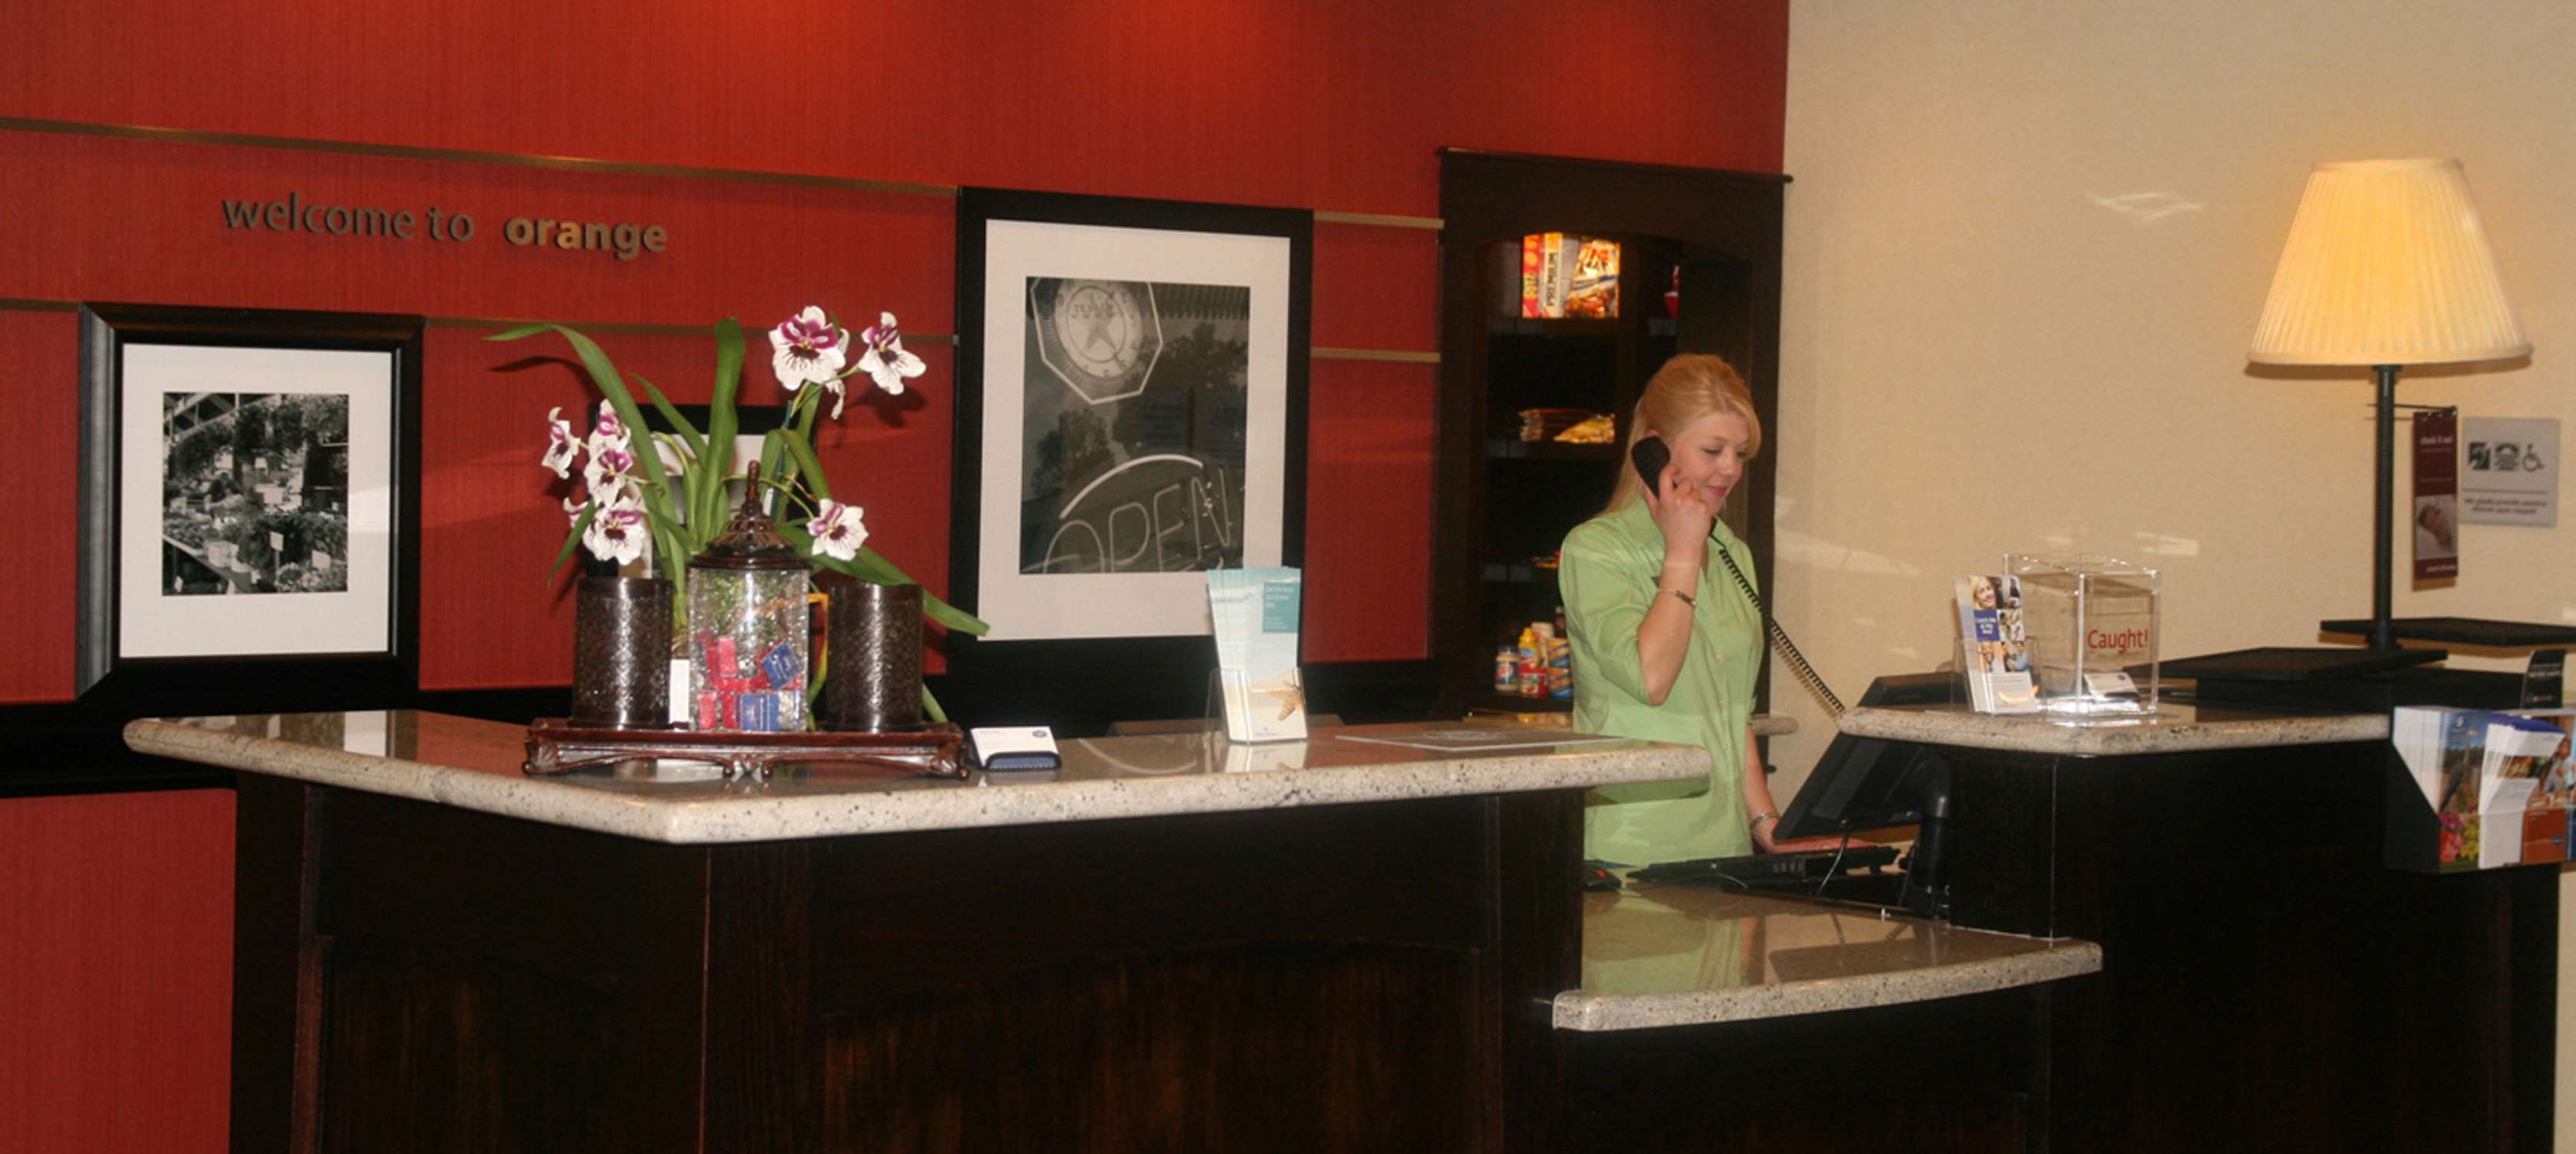 Hampton Inn Orange image 5